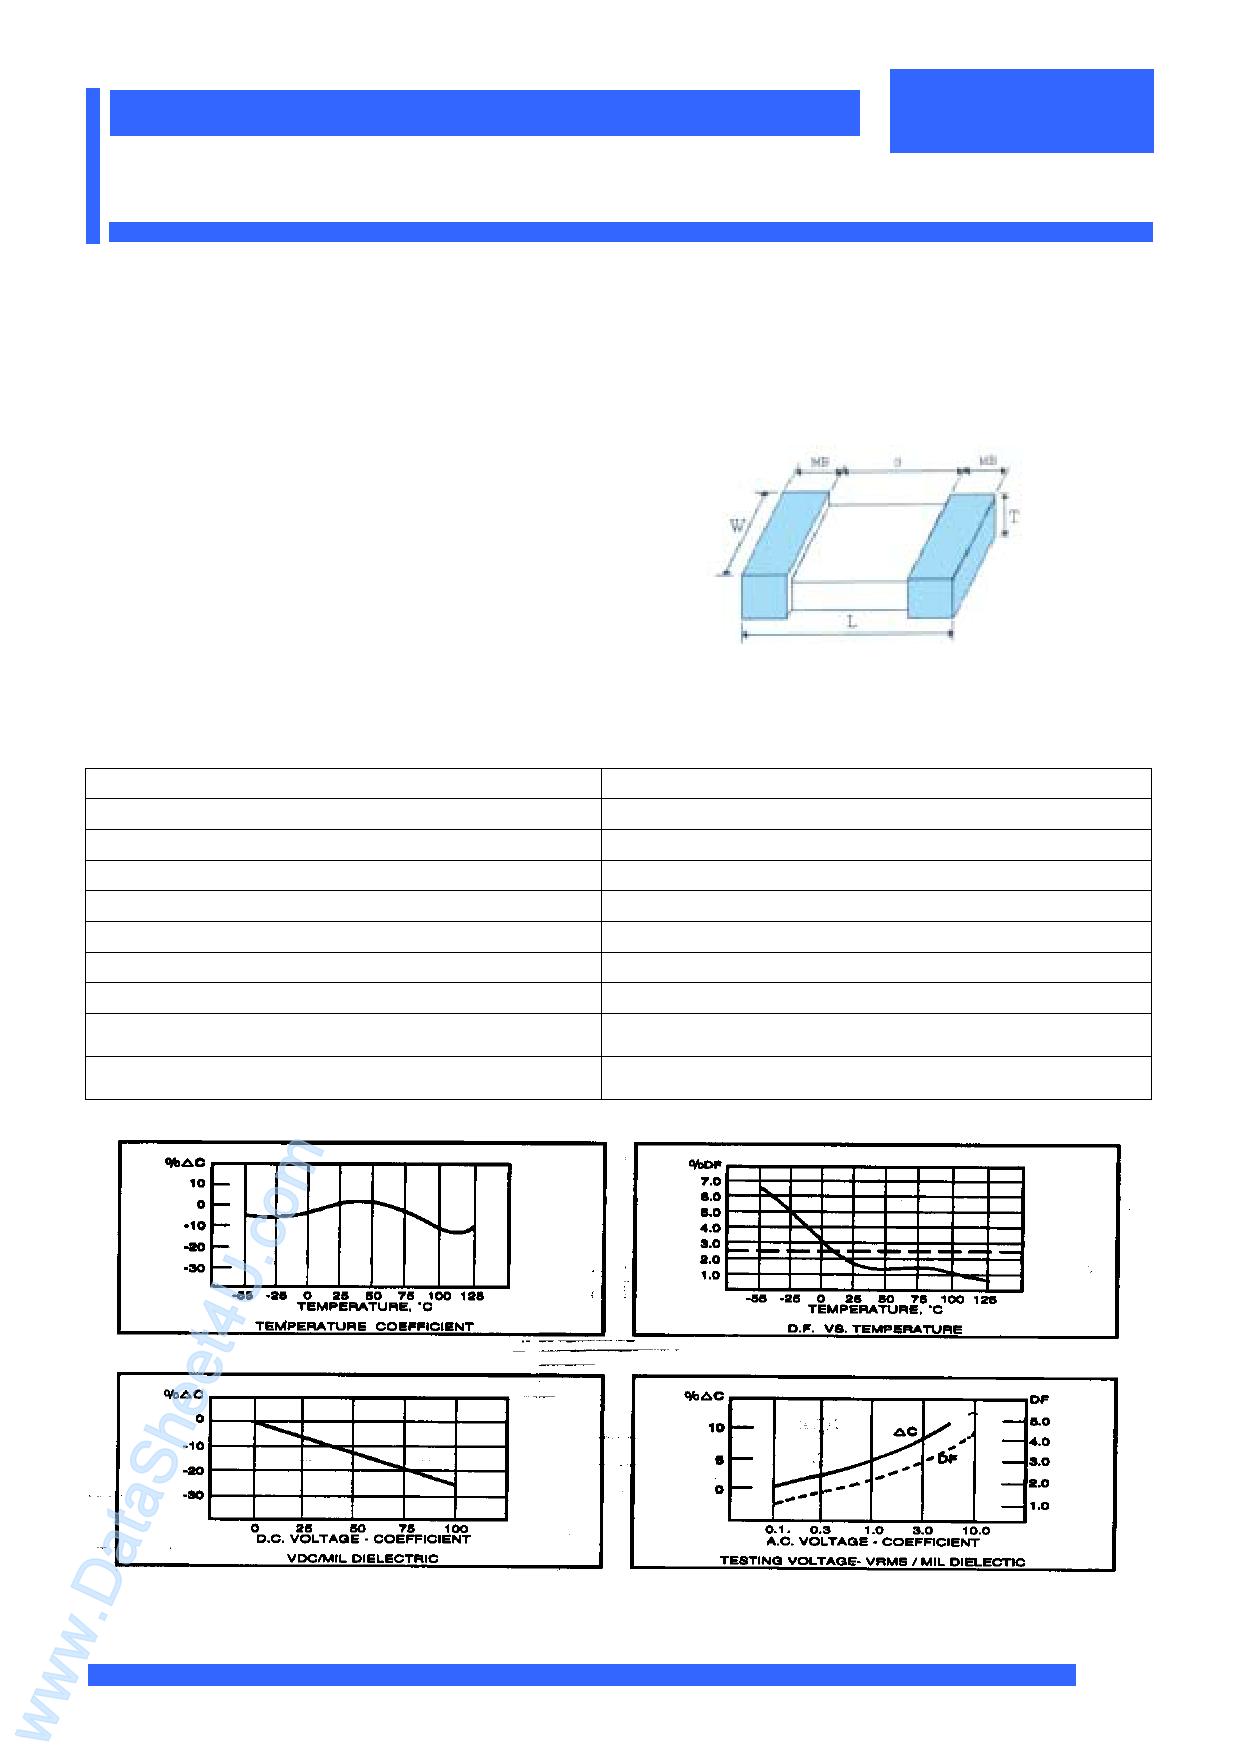 U0603xxxx Hoja de datos, Descripción, Manual